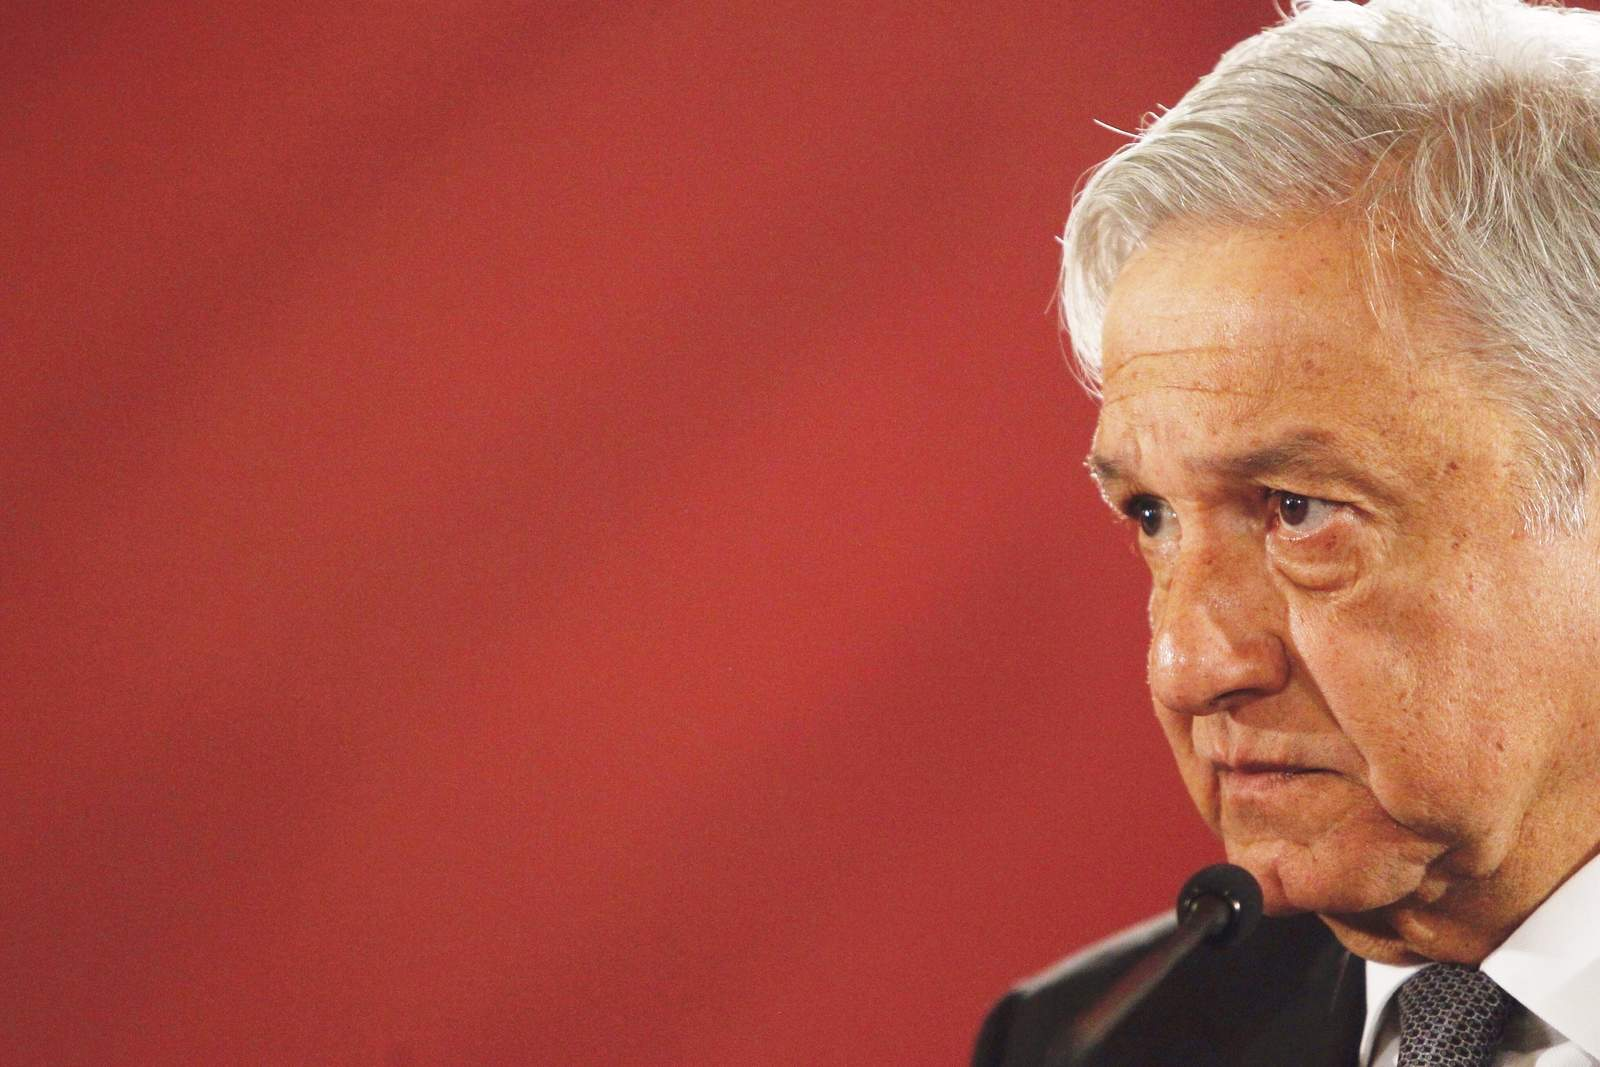 Anuncia López Obrador perforación de nuevos pozos petroleros en Campeche